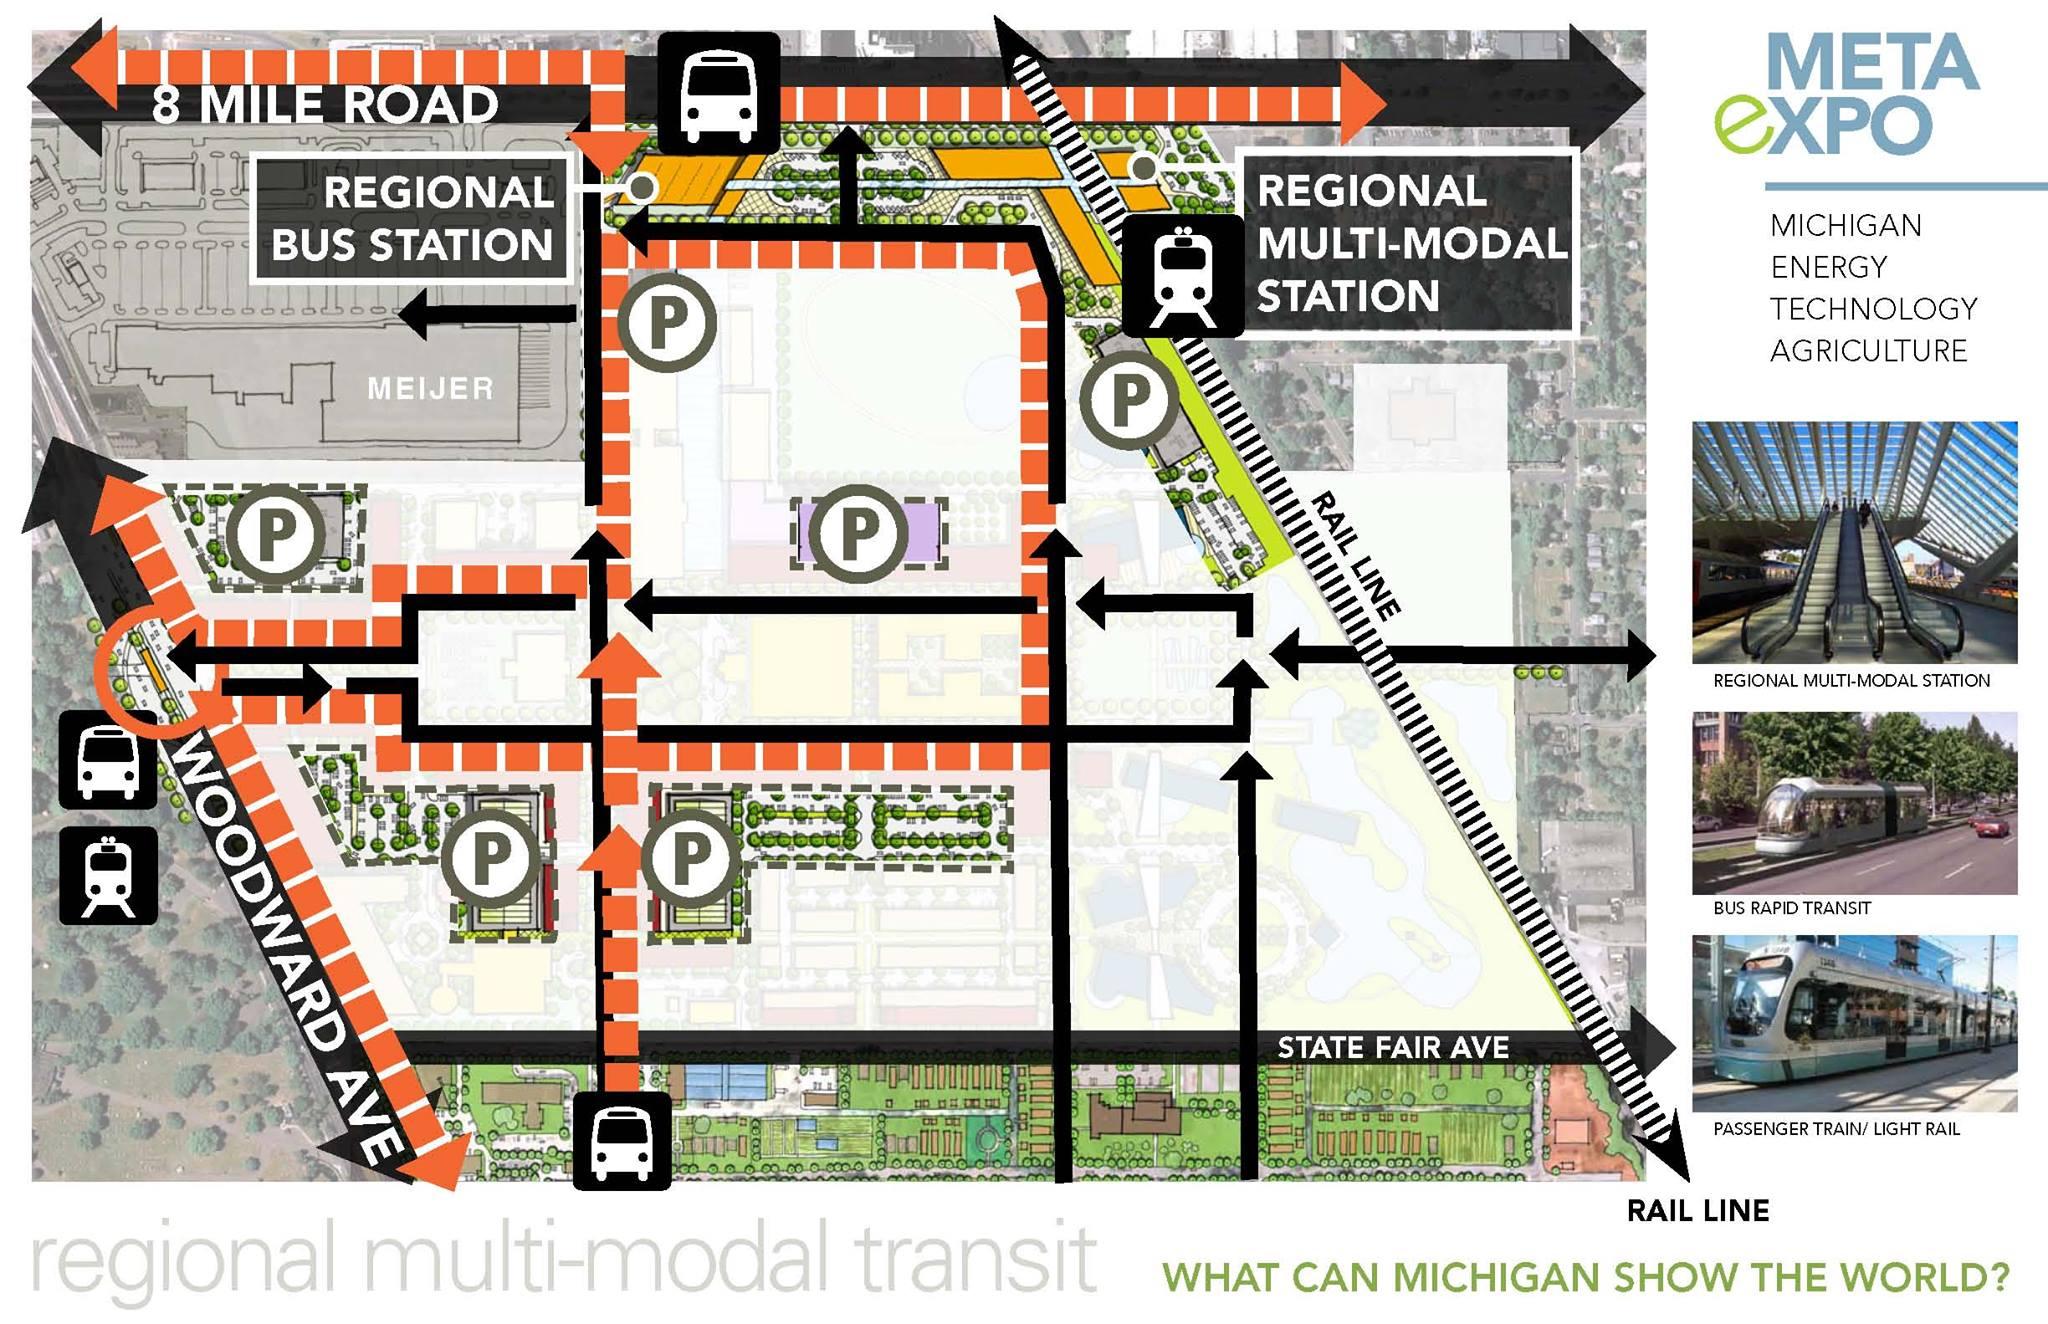 Regional Multi-modal Transit Hub - traffic patterns